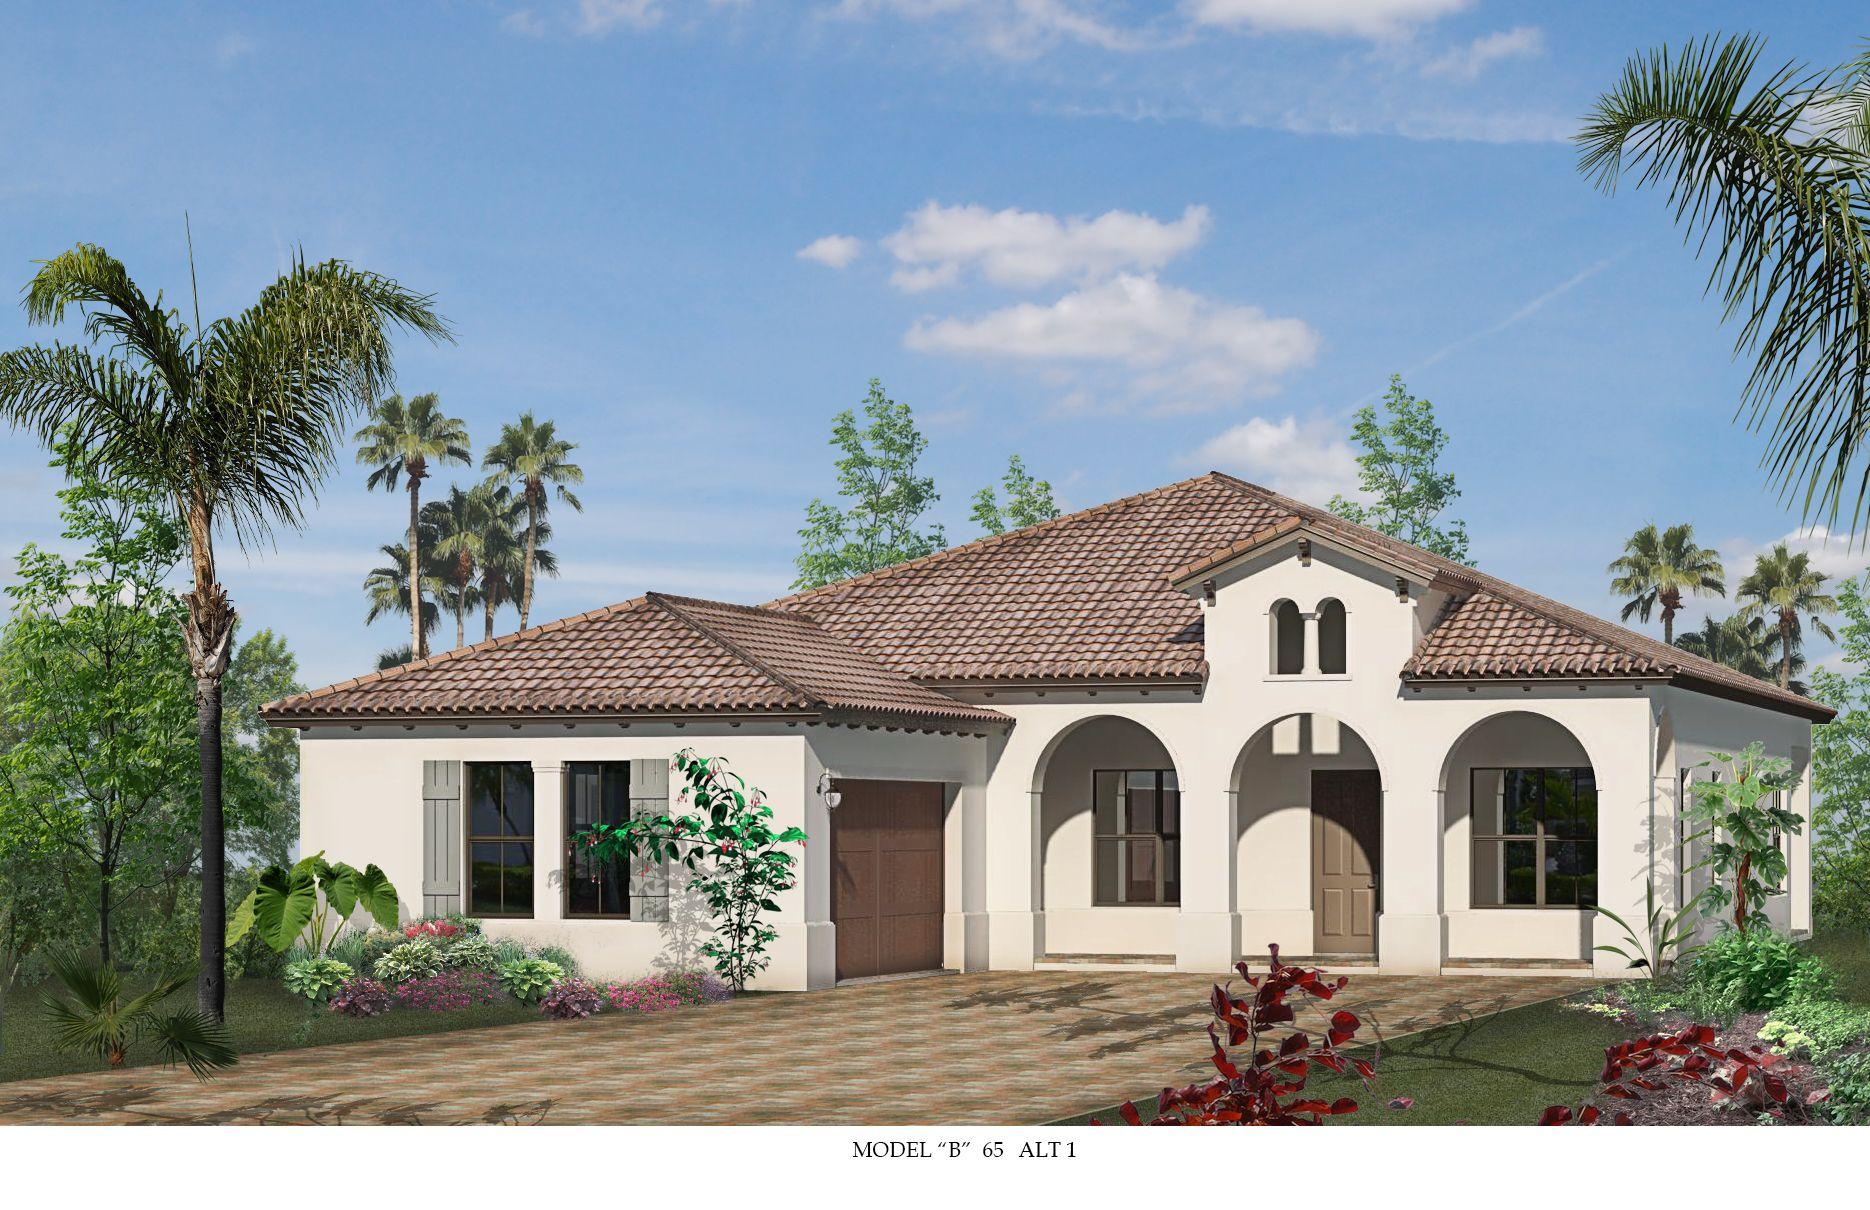 Briones Elevation 1:Designer model home open daily